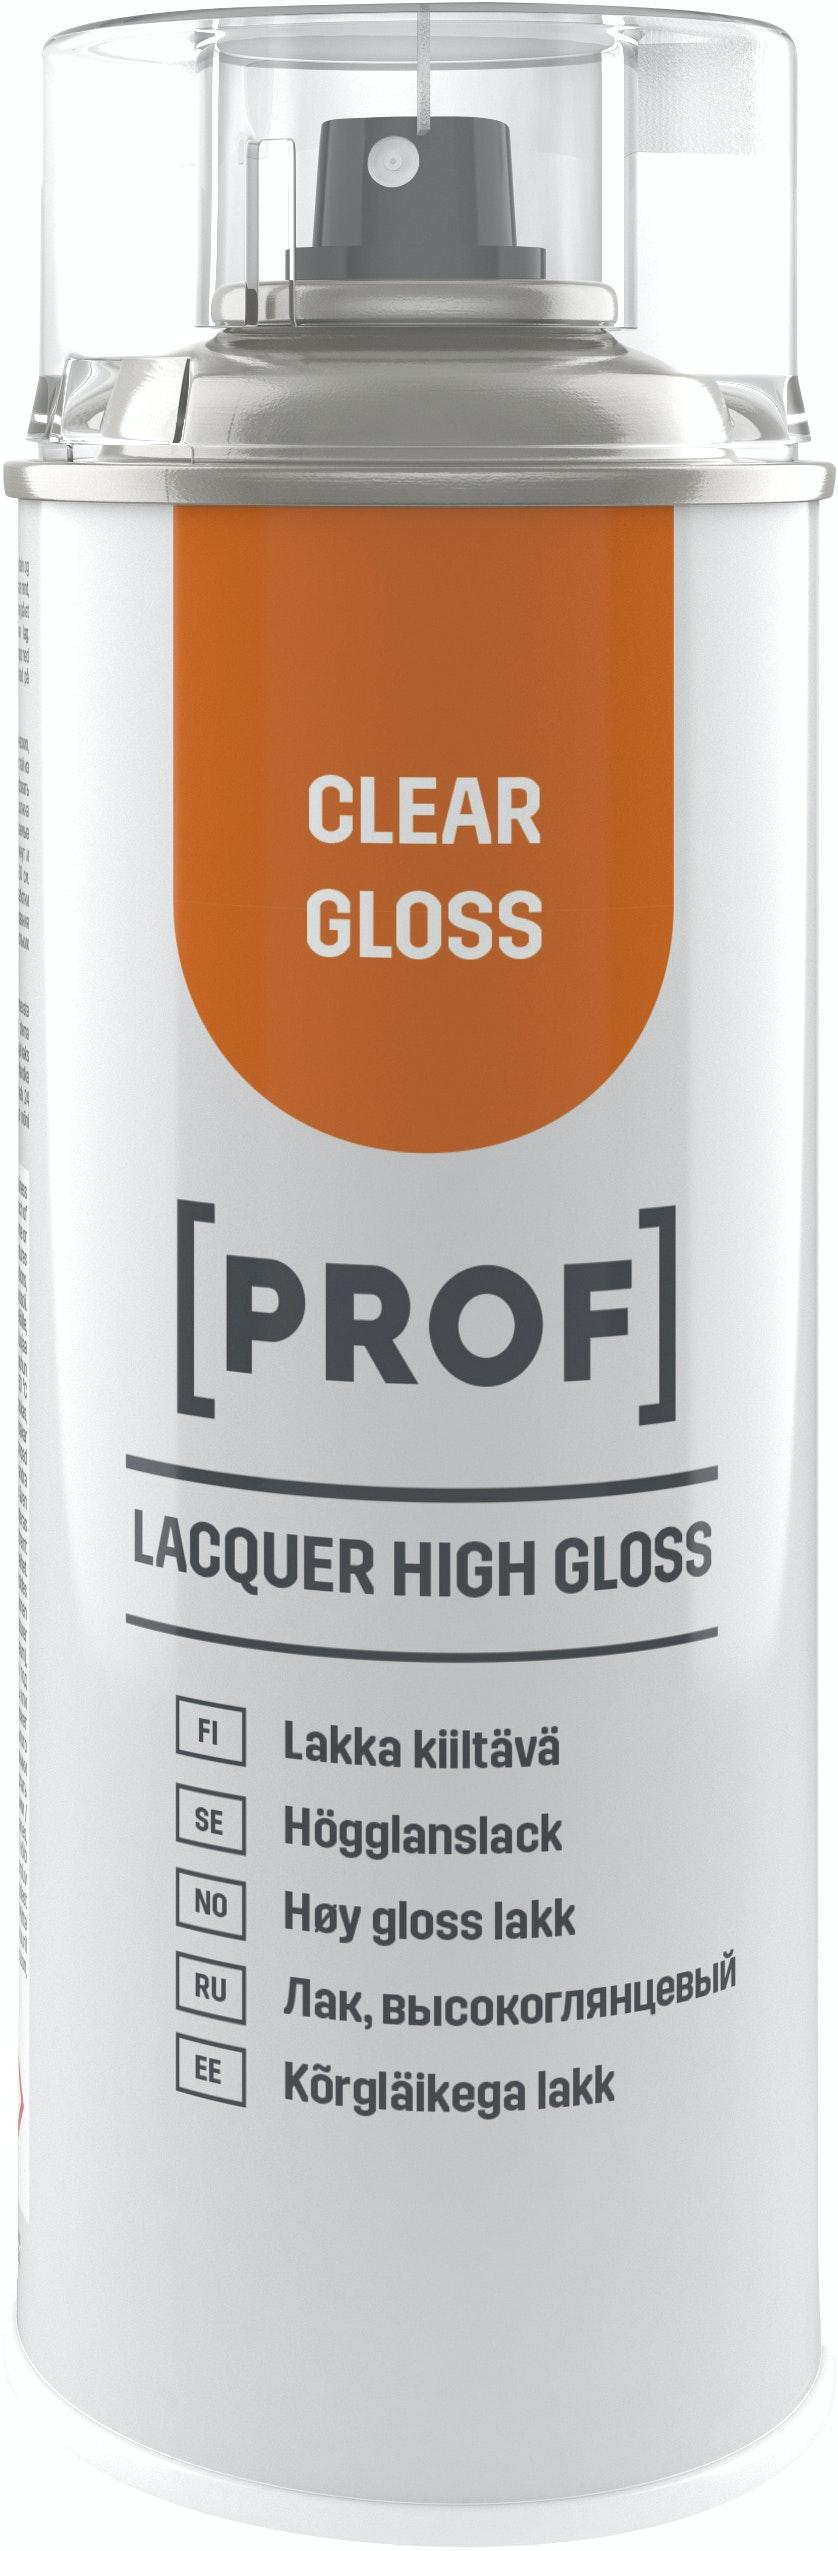 Sprayfärg Prof Professional Högblank Klar 400ml